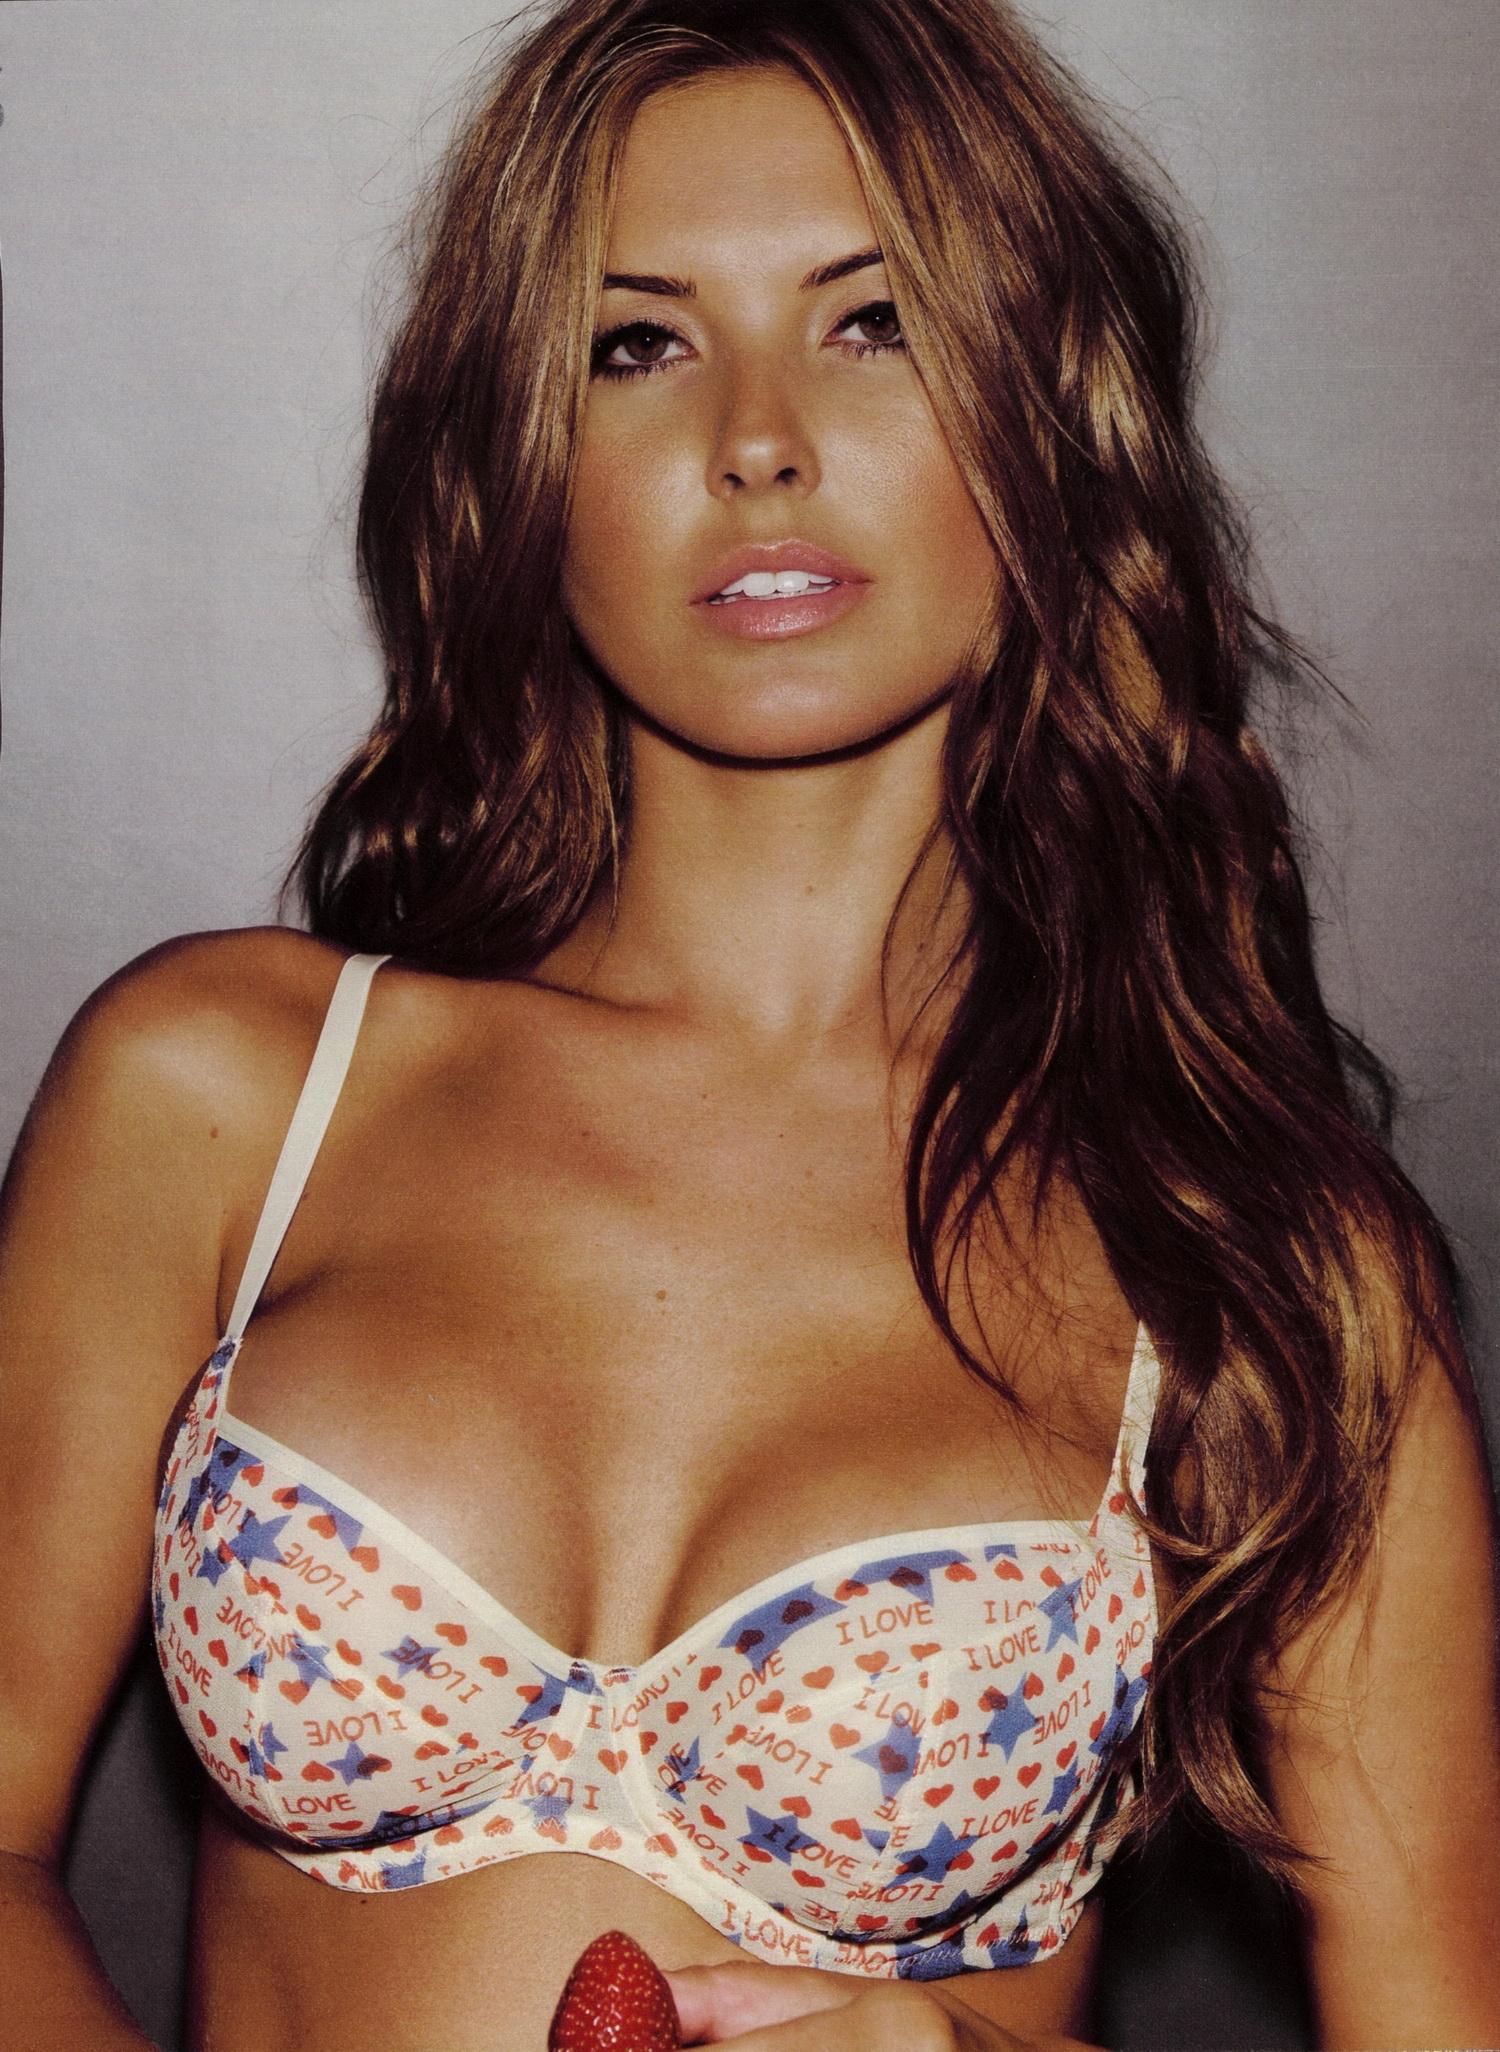 Actress big boob hollywood